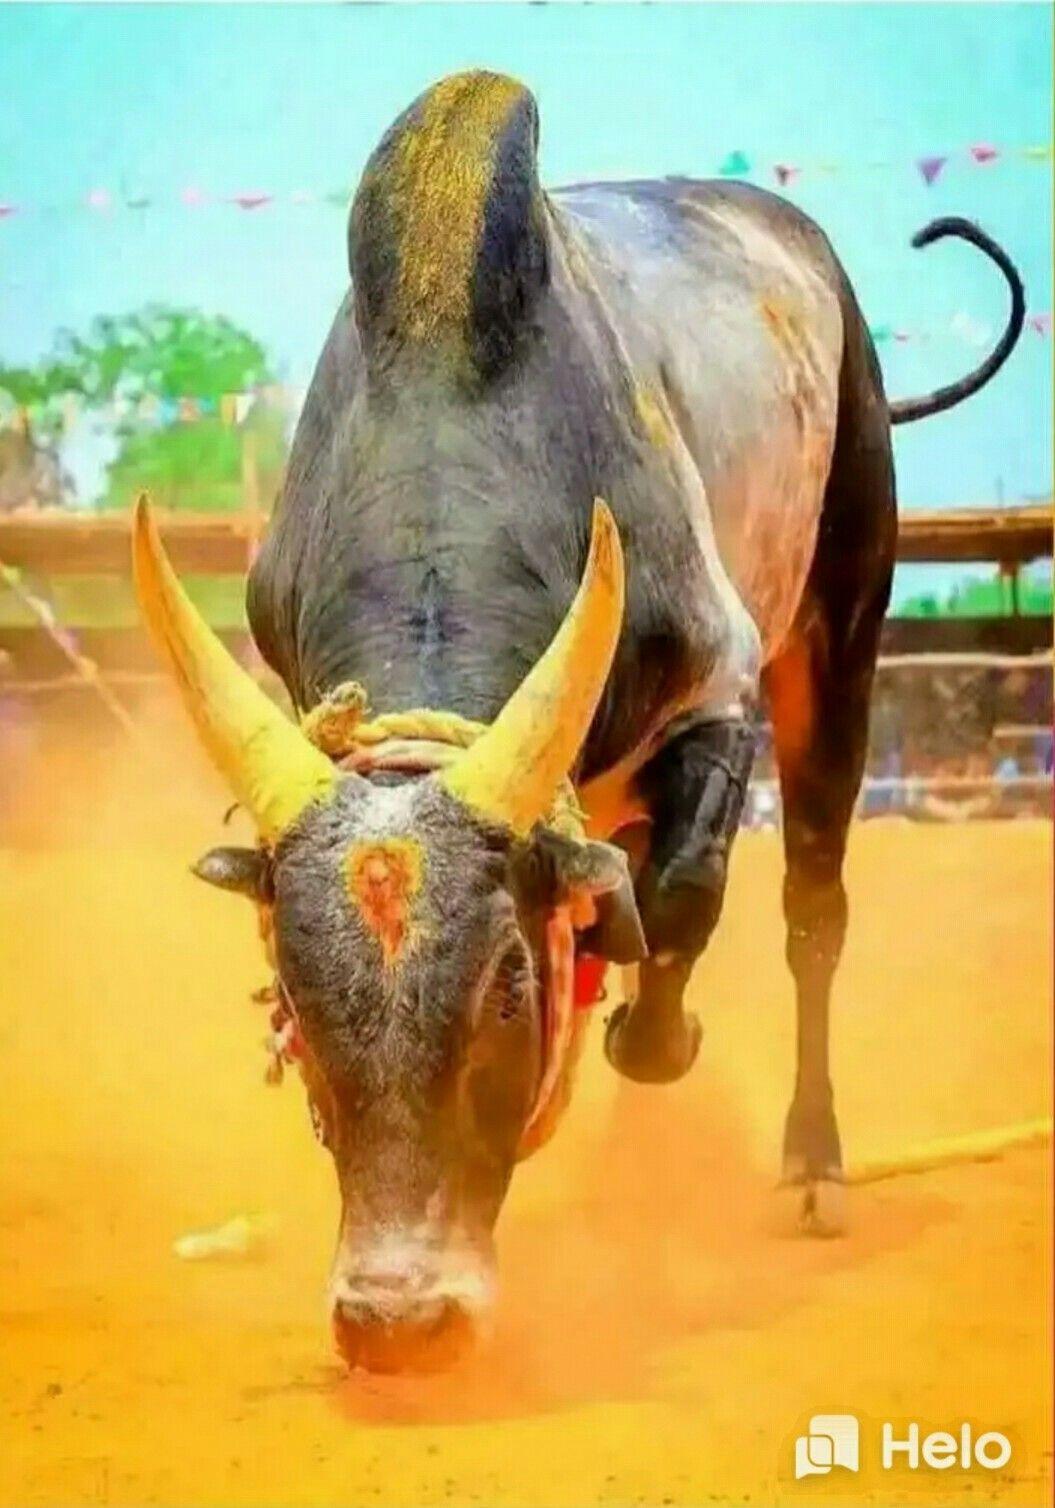 Bull painting image by Aman Kr Saini 1055x1508